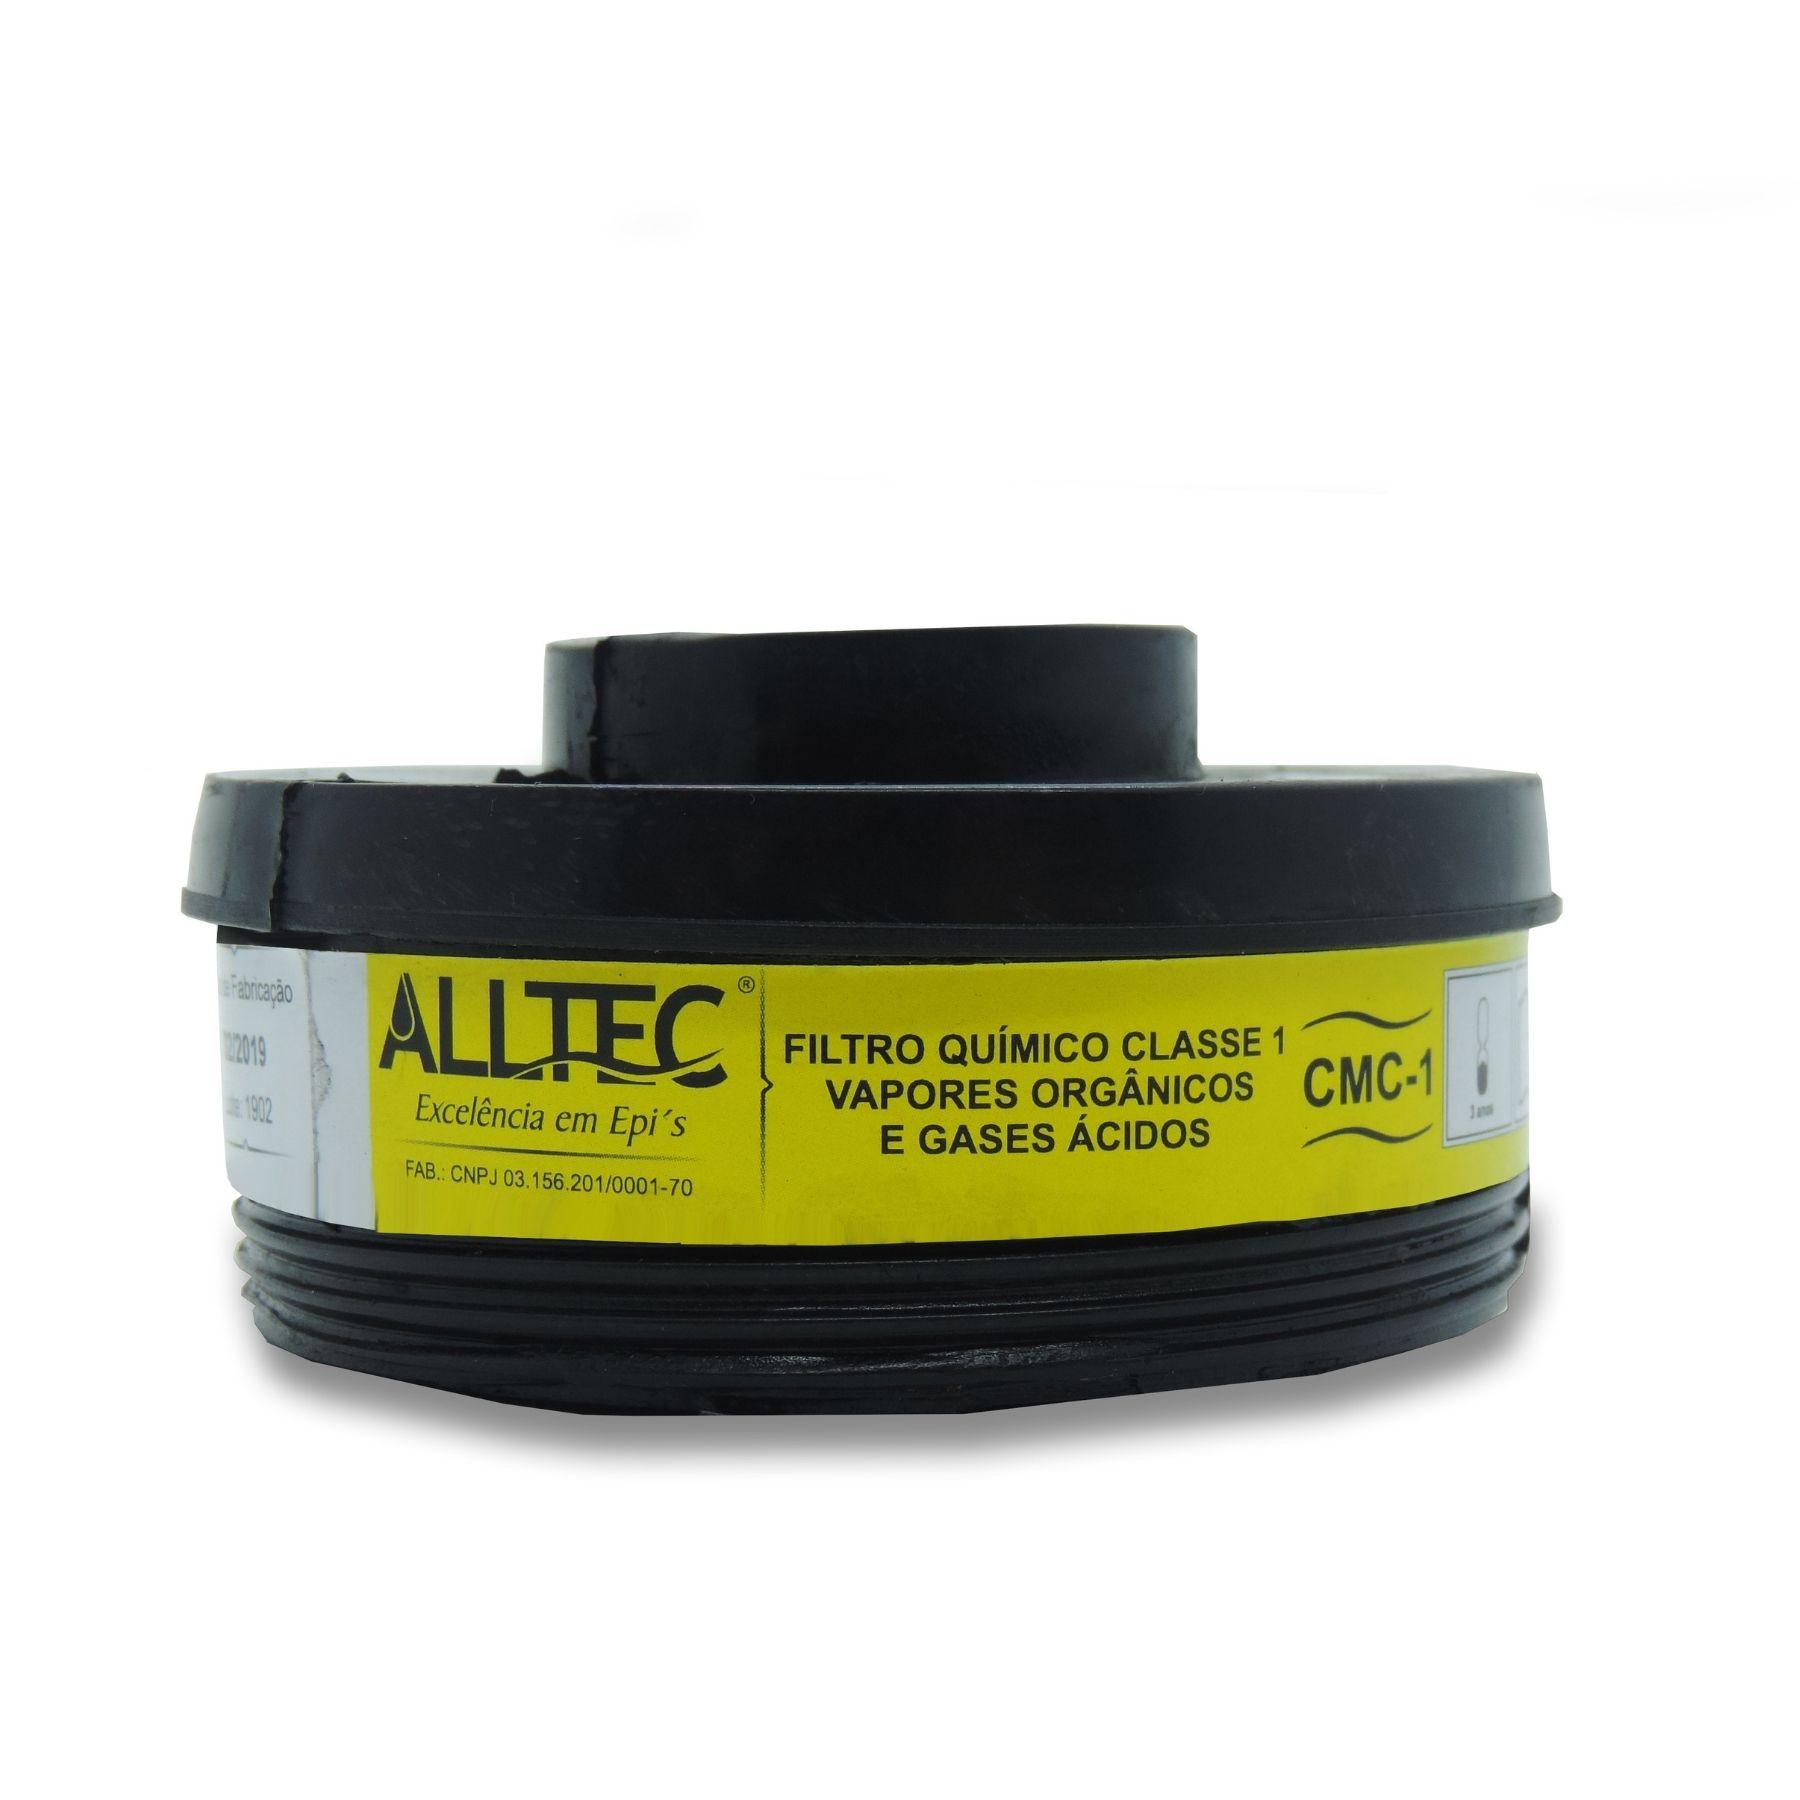 Filtro p/ Máscara Semifacial VO/GA Alltec Preto